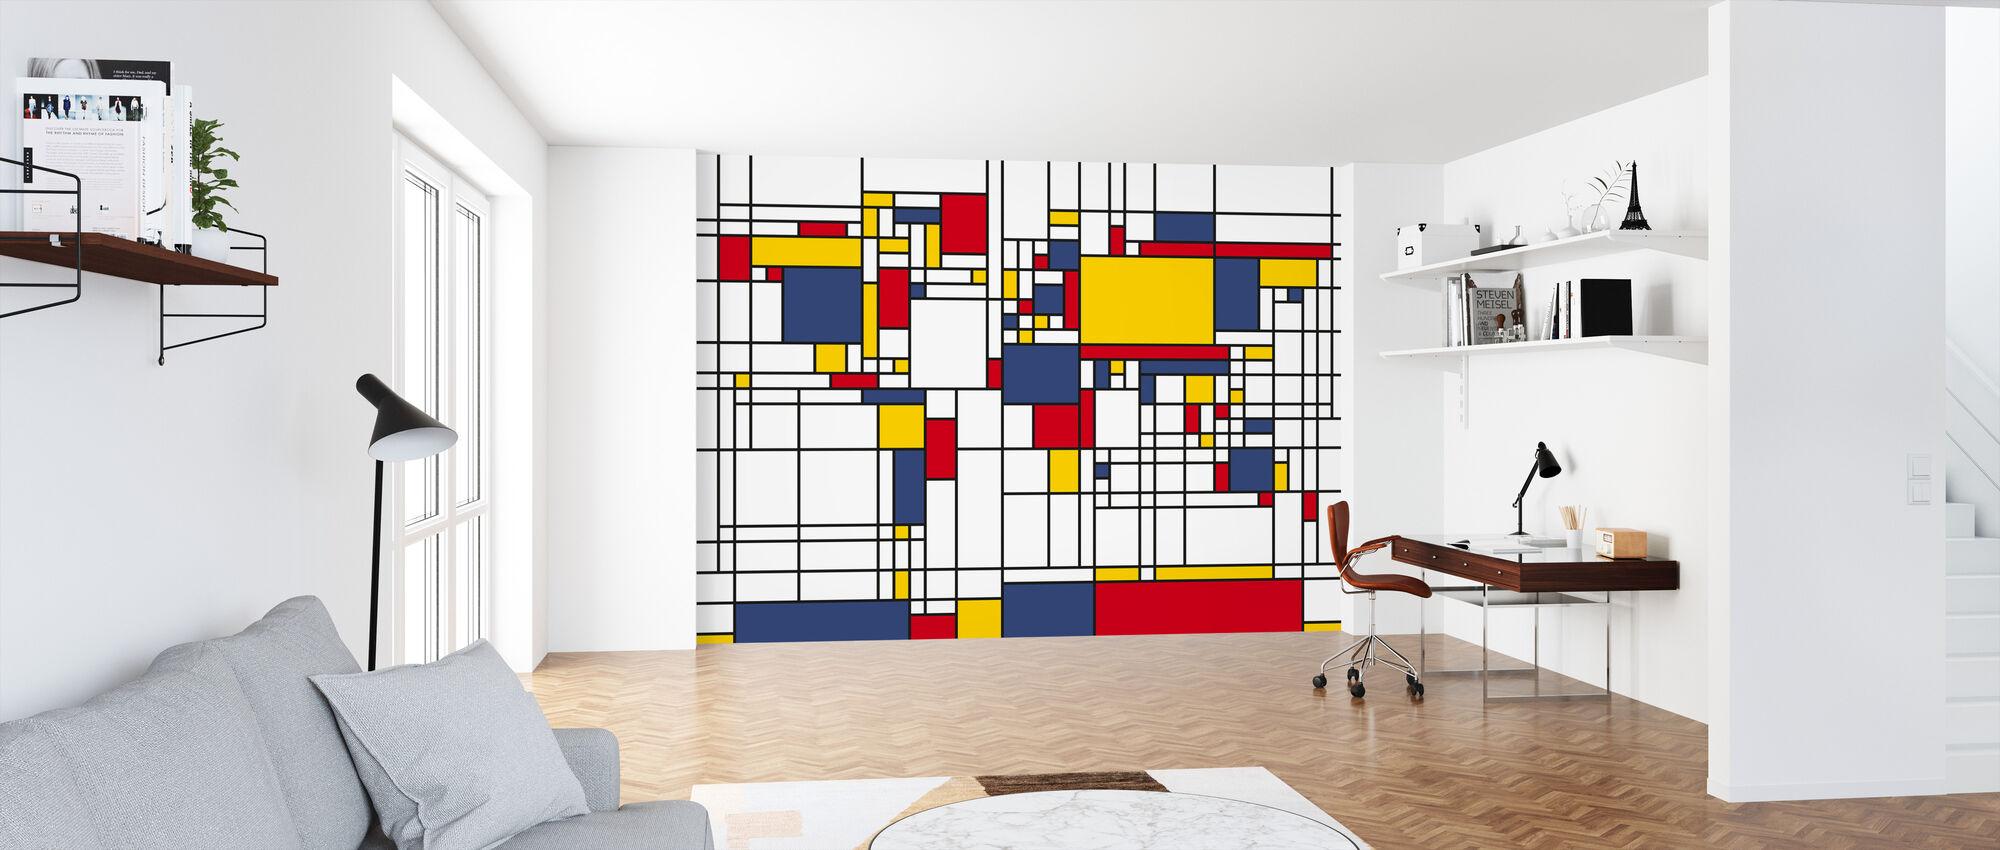 Piet Mondrian Style World Map